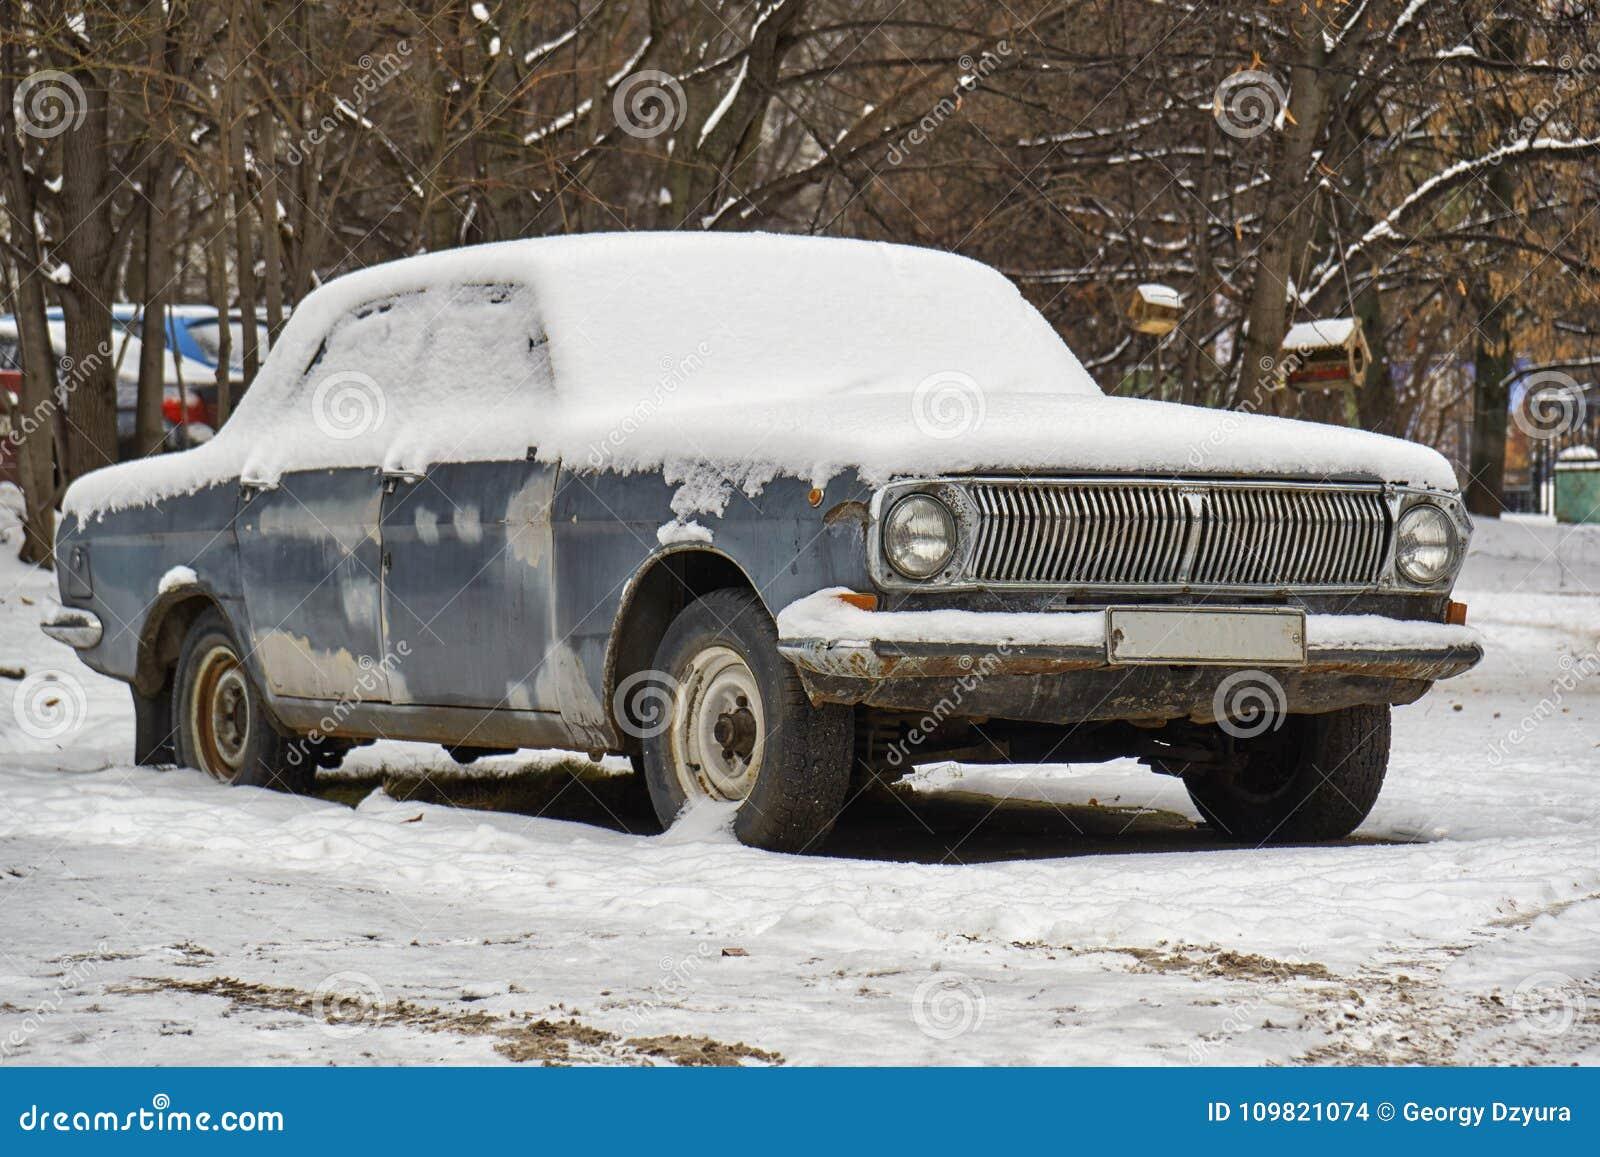 Soviet retro car Volga abandoned on the street